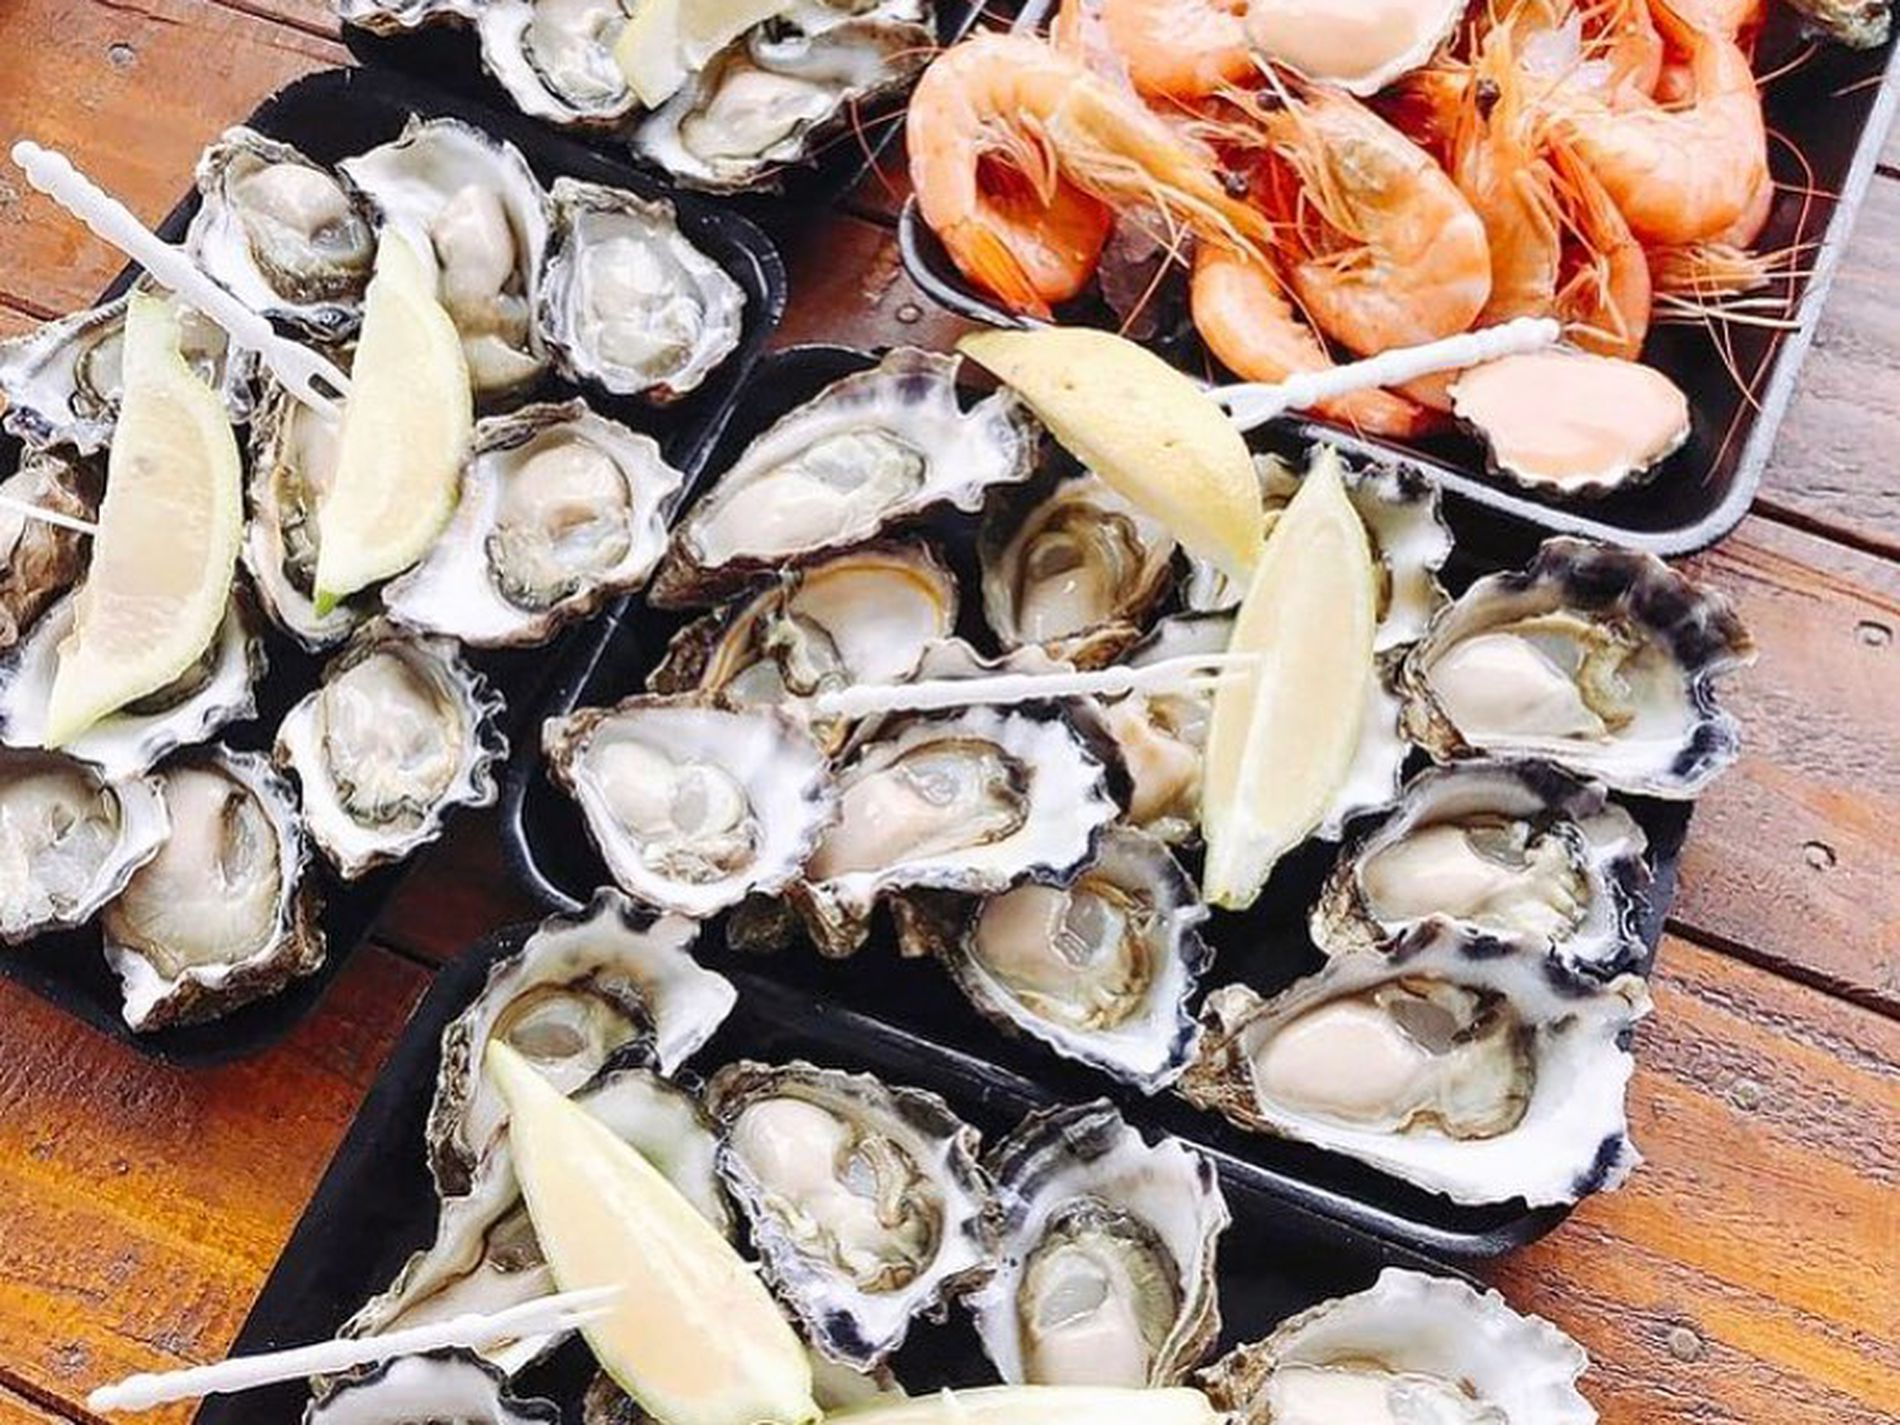 Food and More Culburra Beach